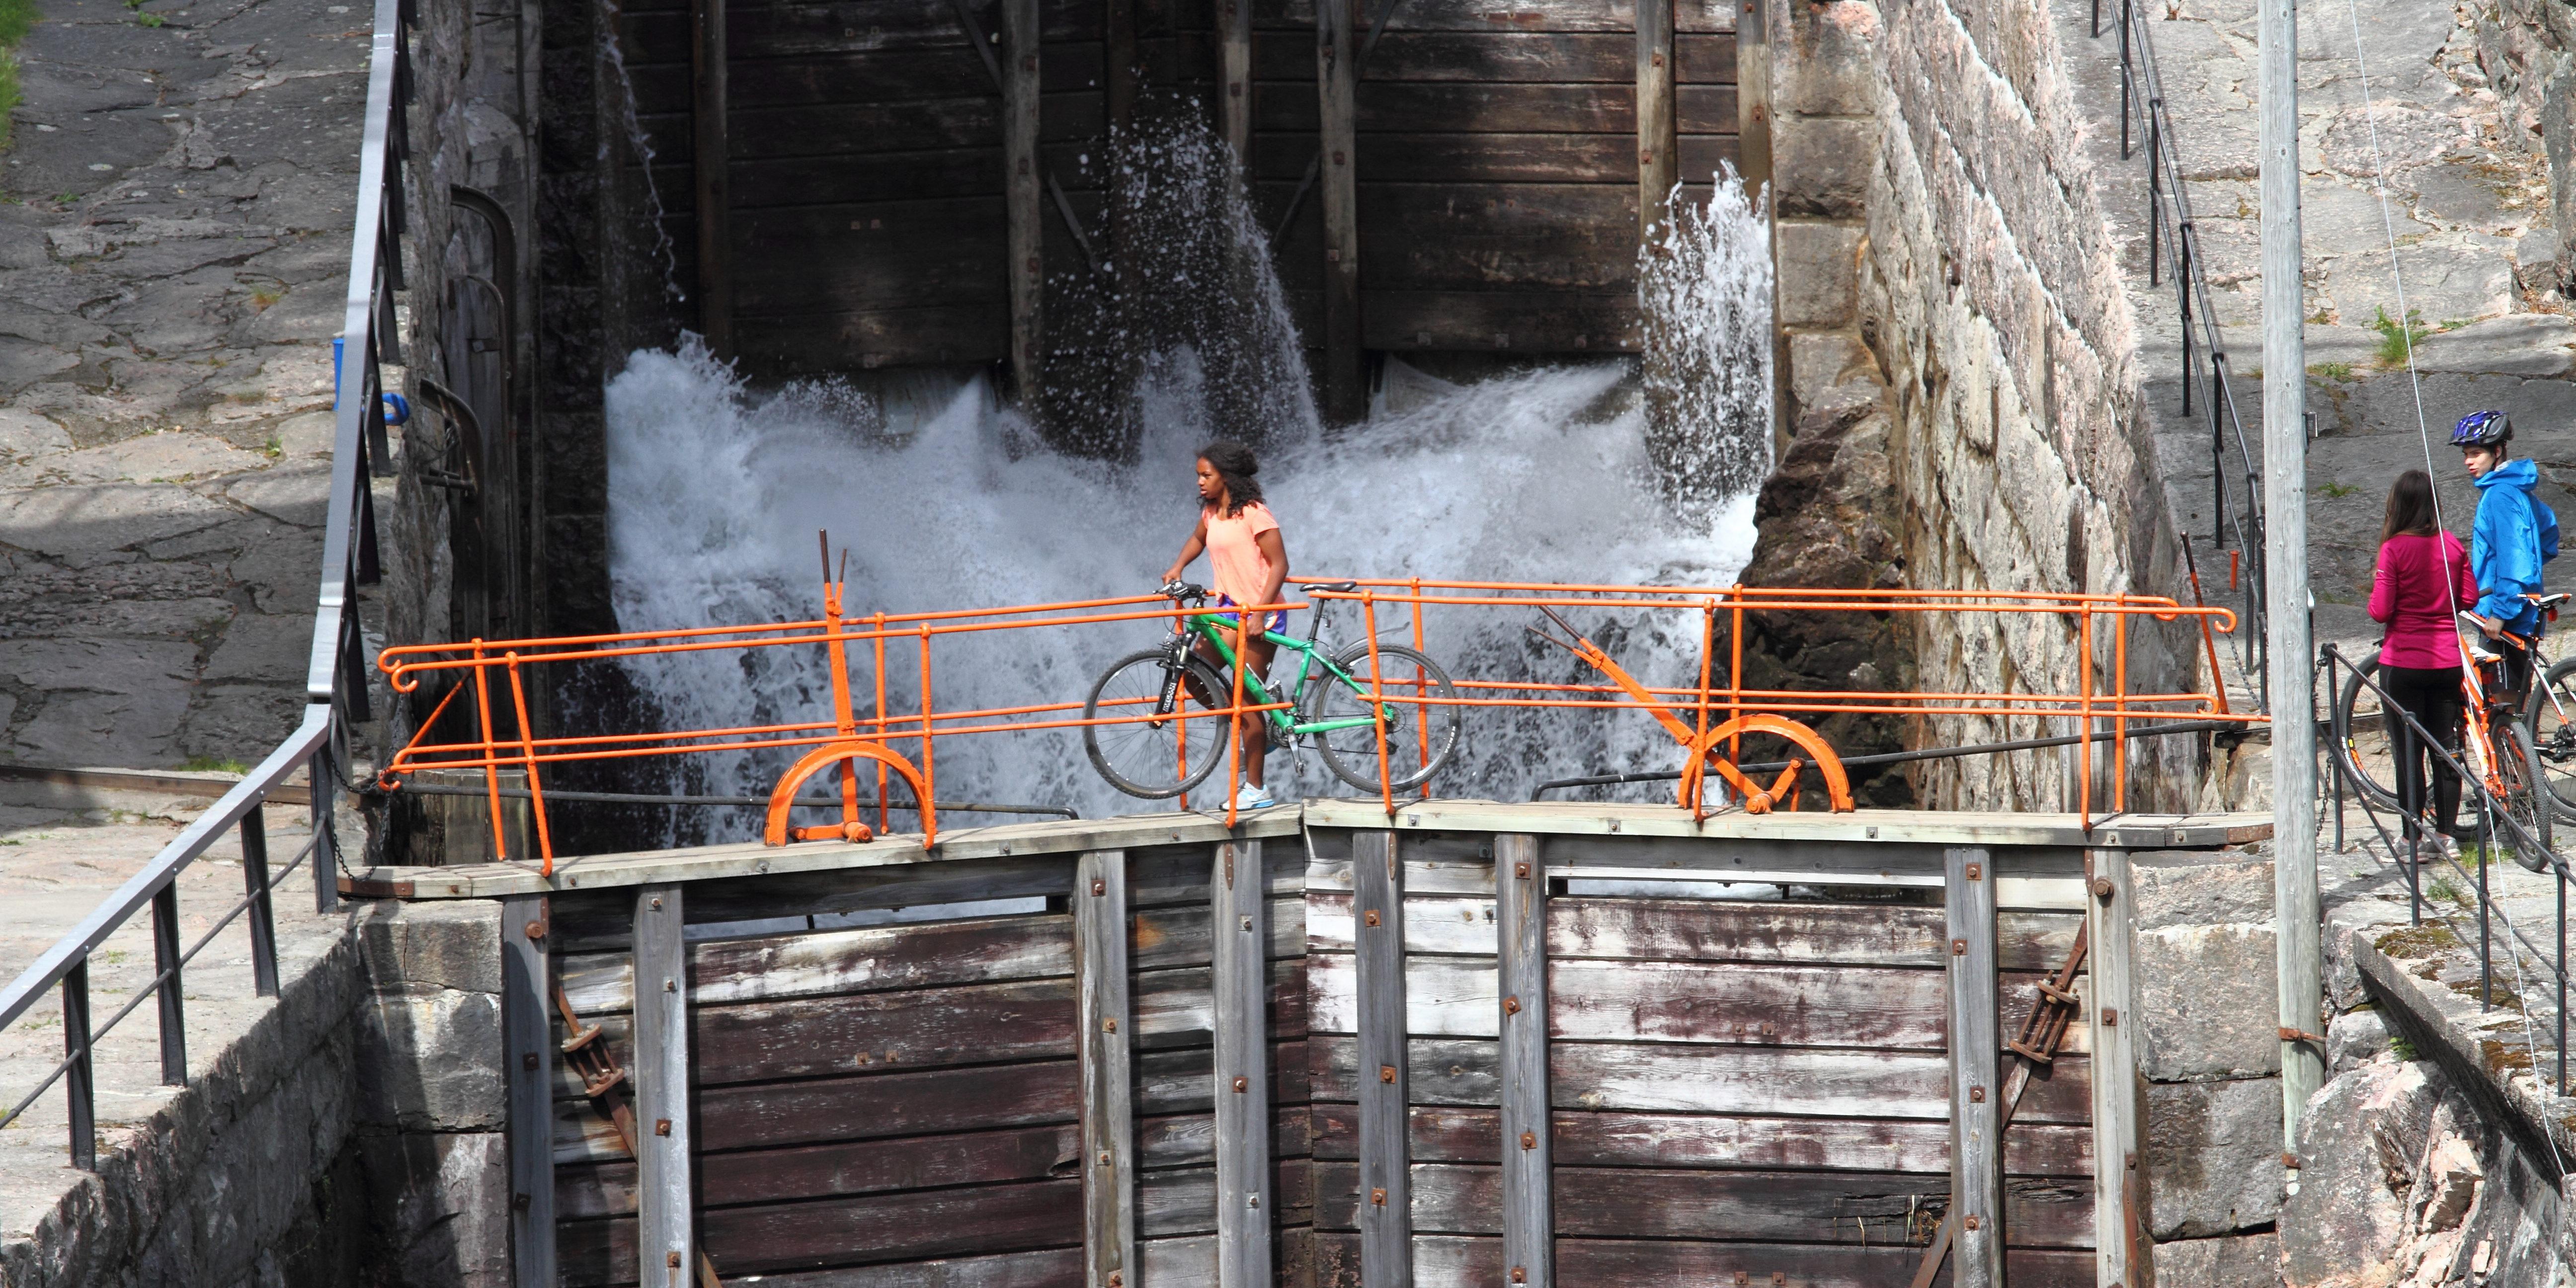 Sykling langs Telemarkskanalen er en populær aktivitet i sesongen Foto: Hamish Moore